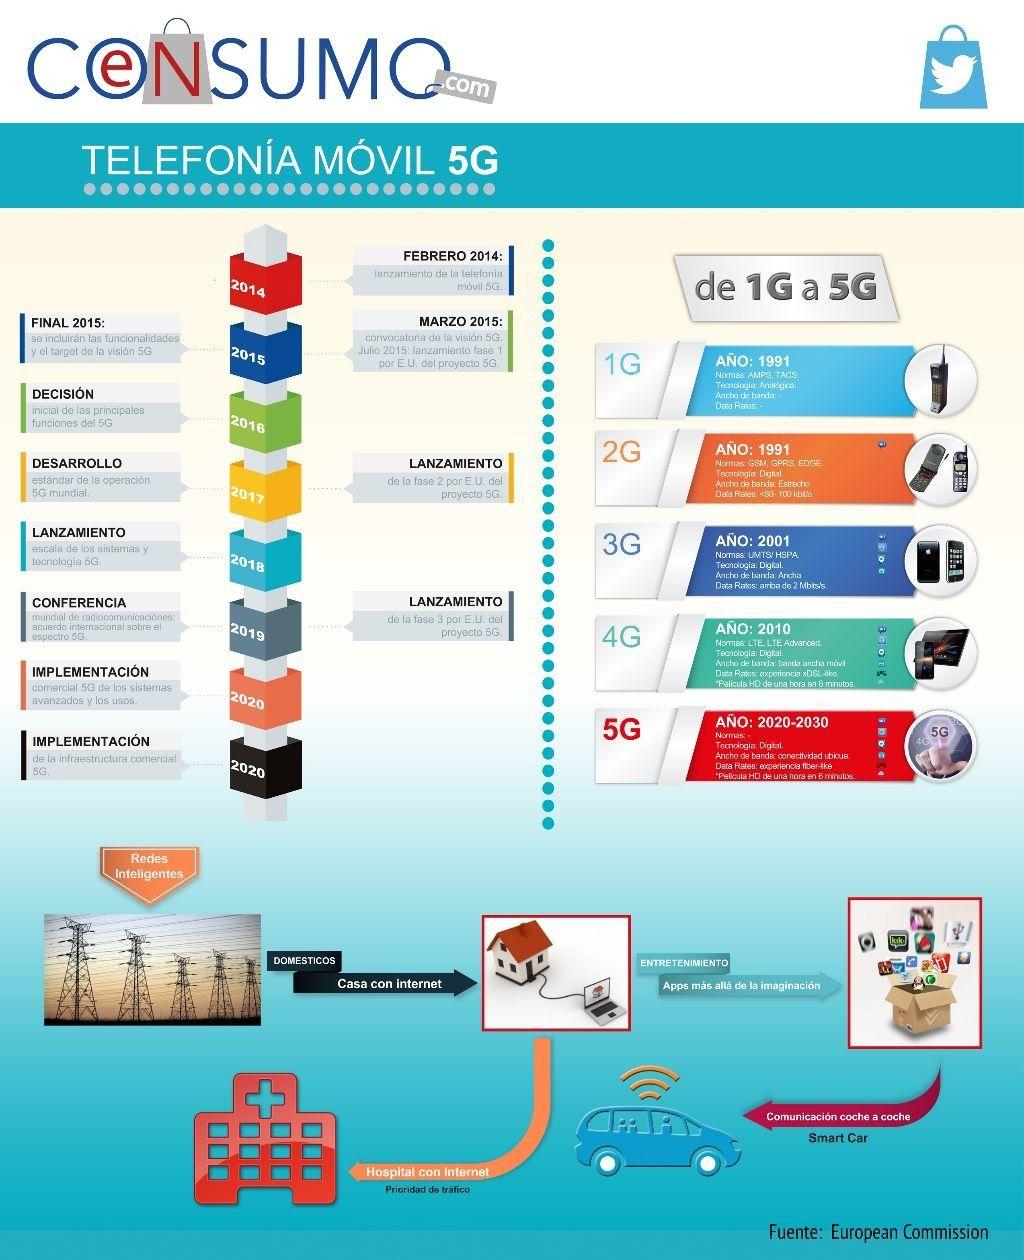 Telefonía Móvil #5G #4G #LTE, #celulares #comunicaciones #internet